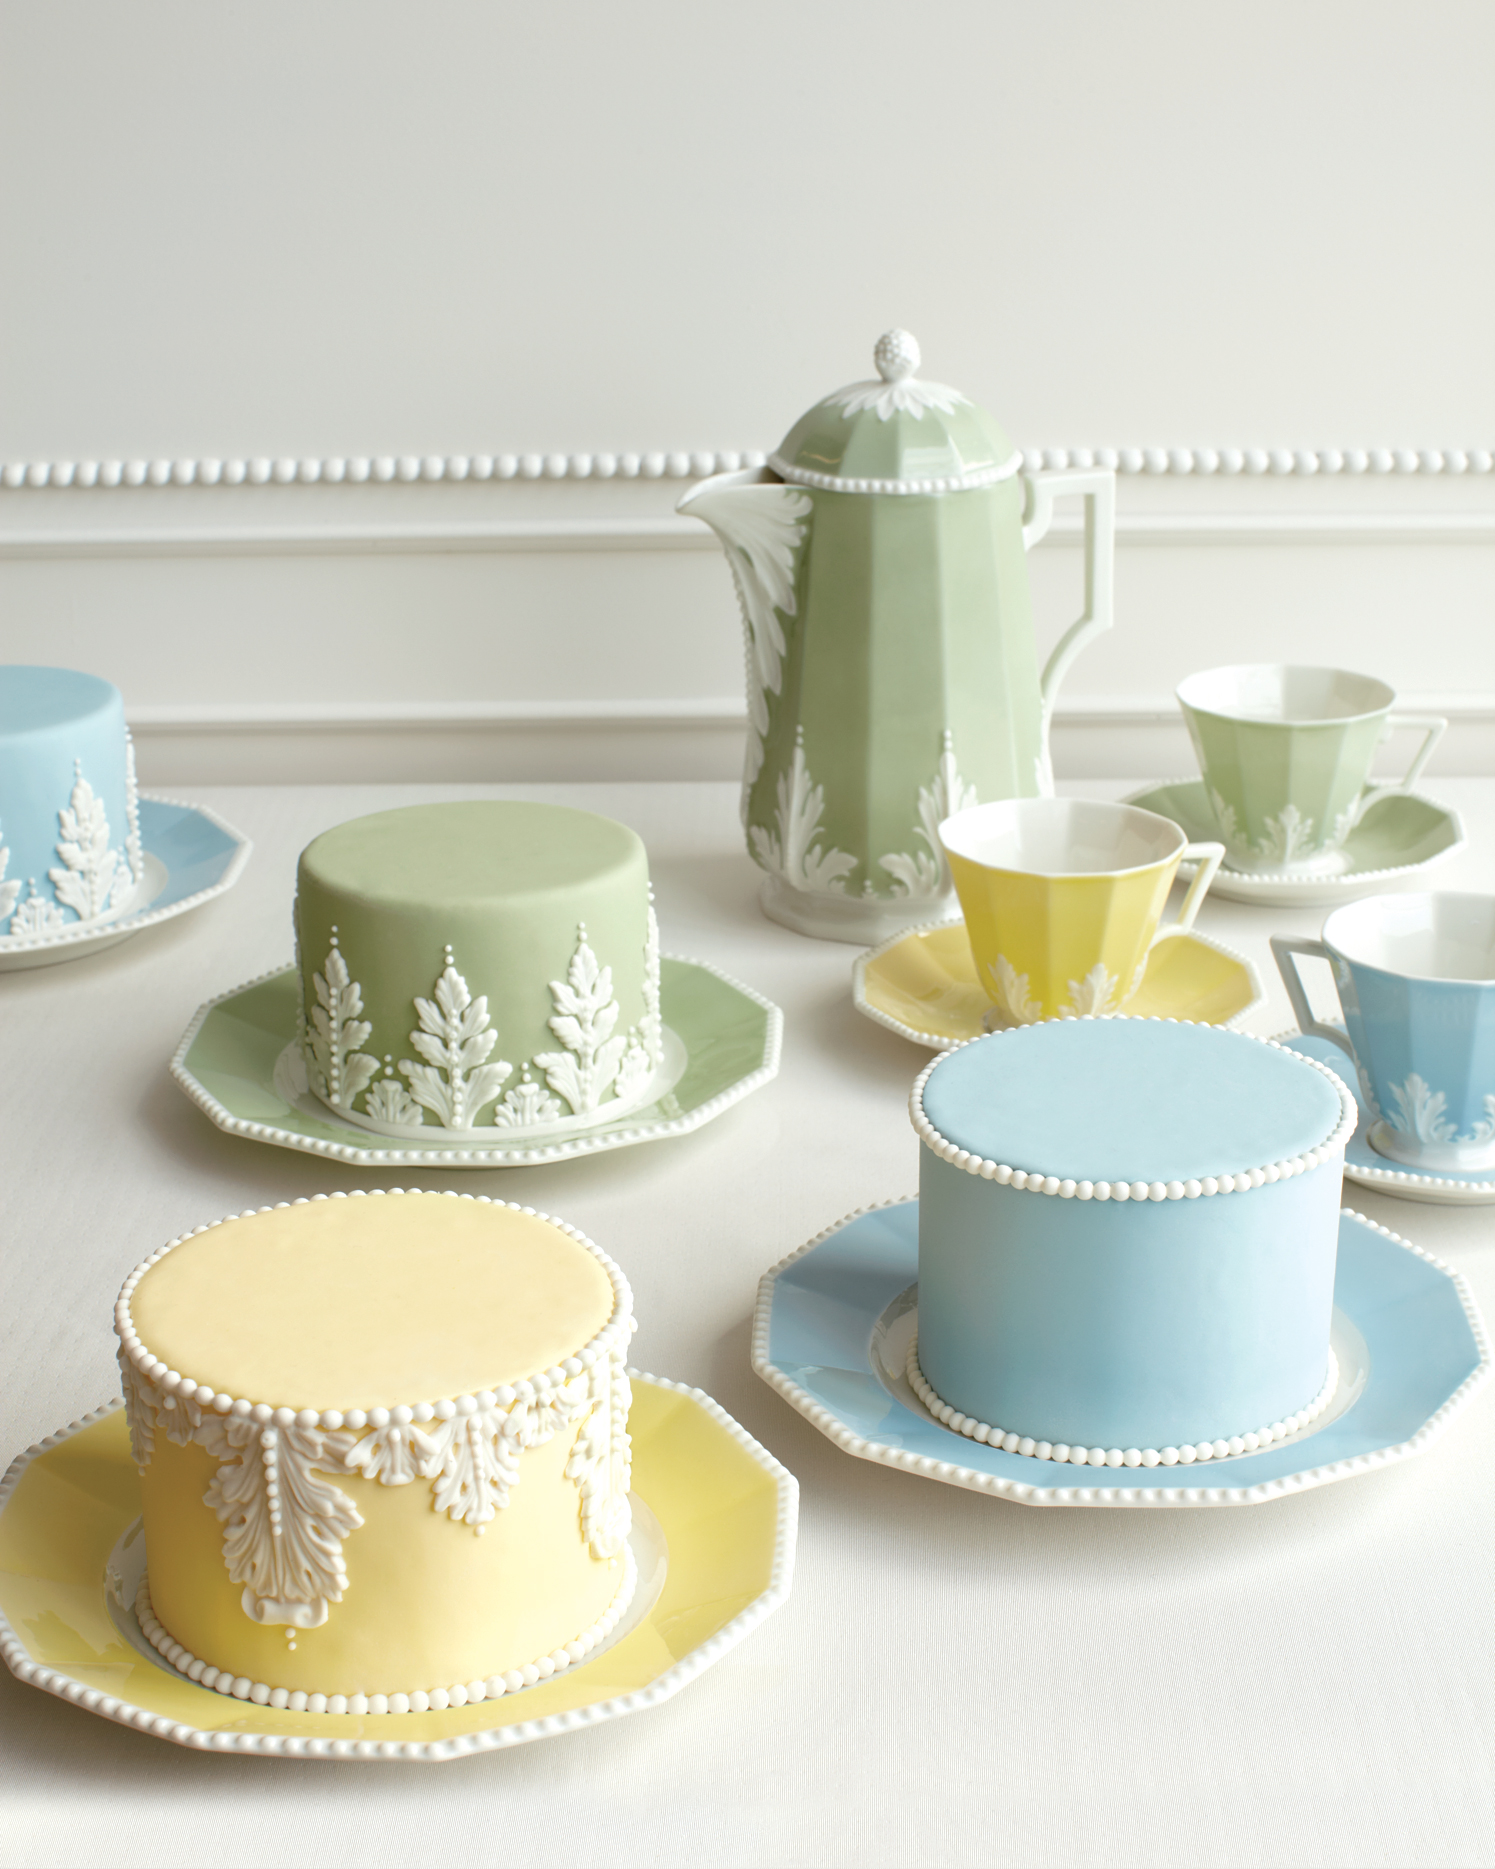 mini-cakes-mwd107844.jpg